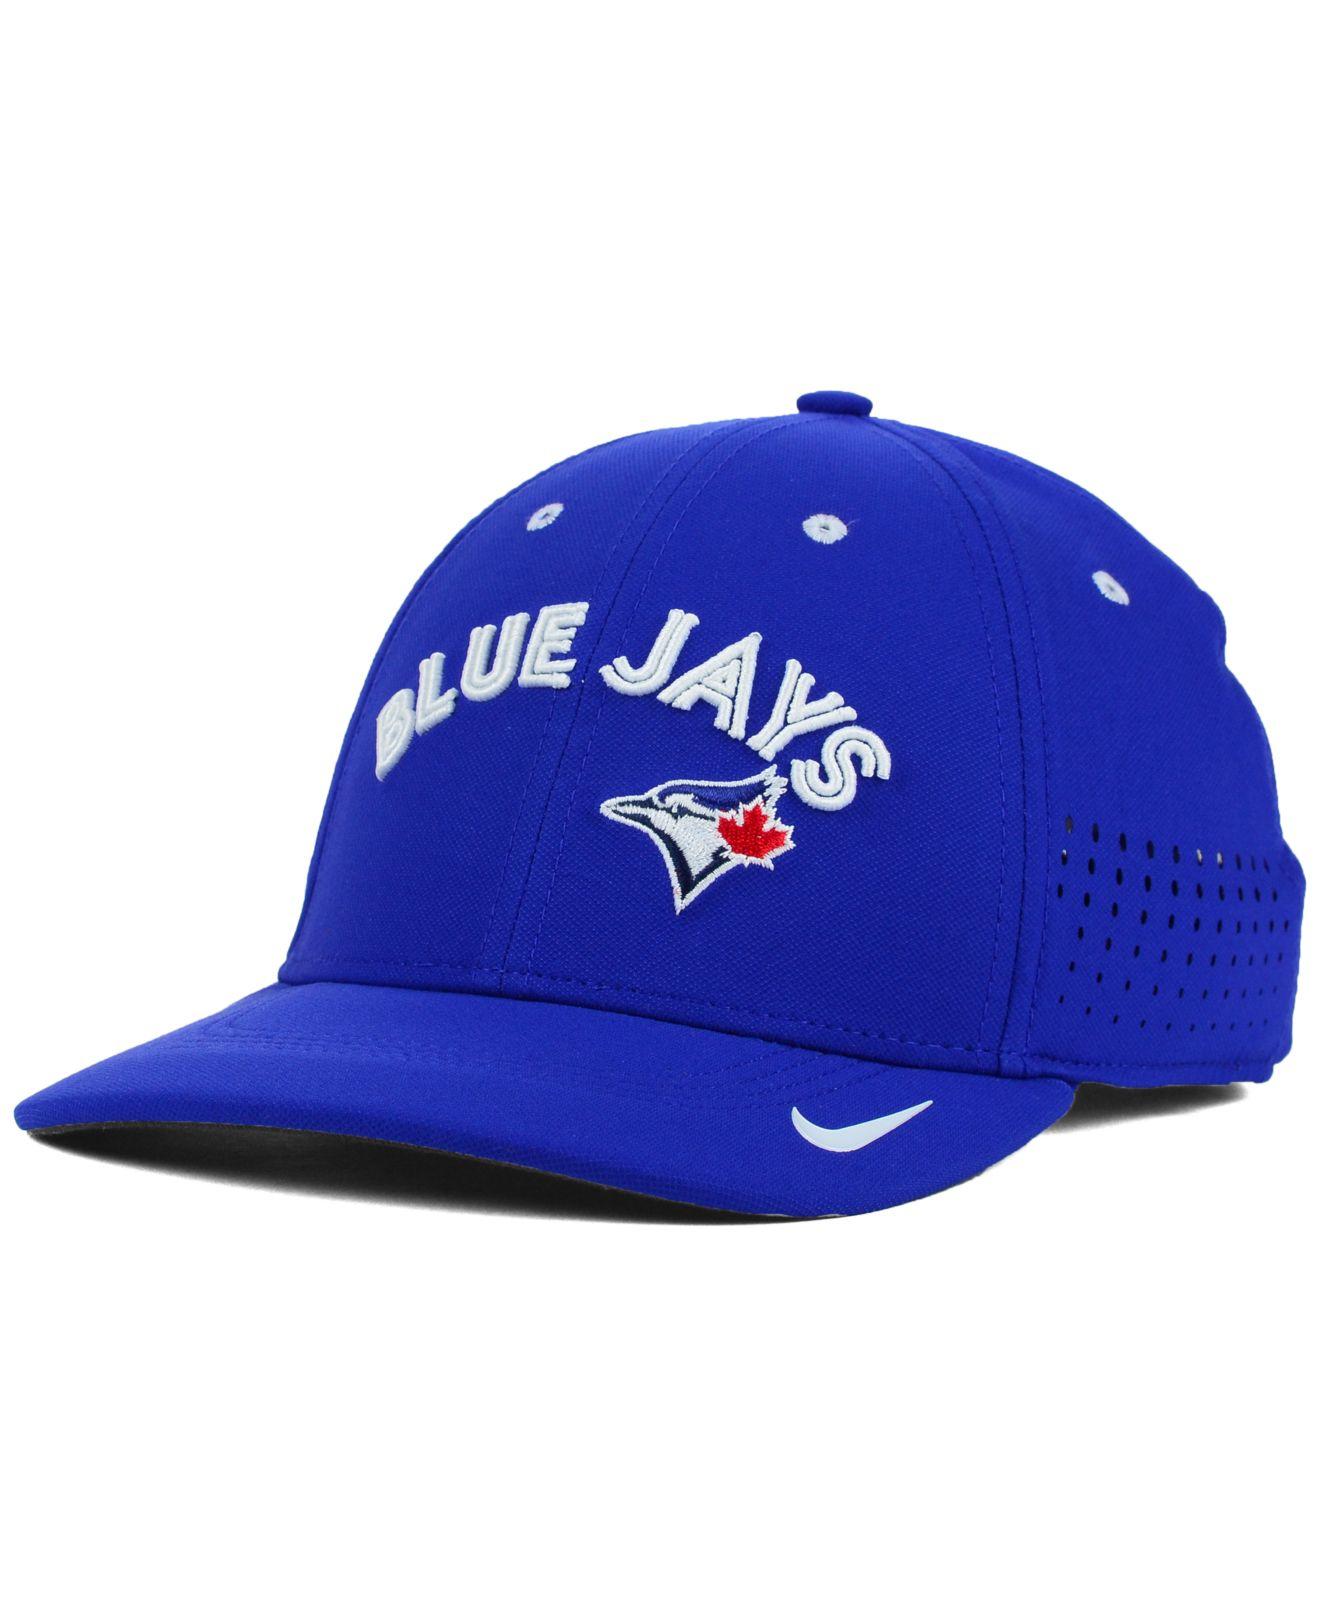 f9e61226f9b Lyst - Nike Toronto Blue Jays Vapor Swoosh Flex Cap in Blue for Men